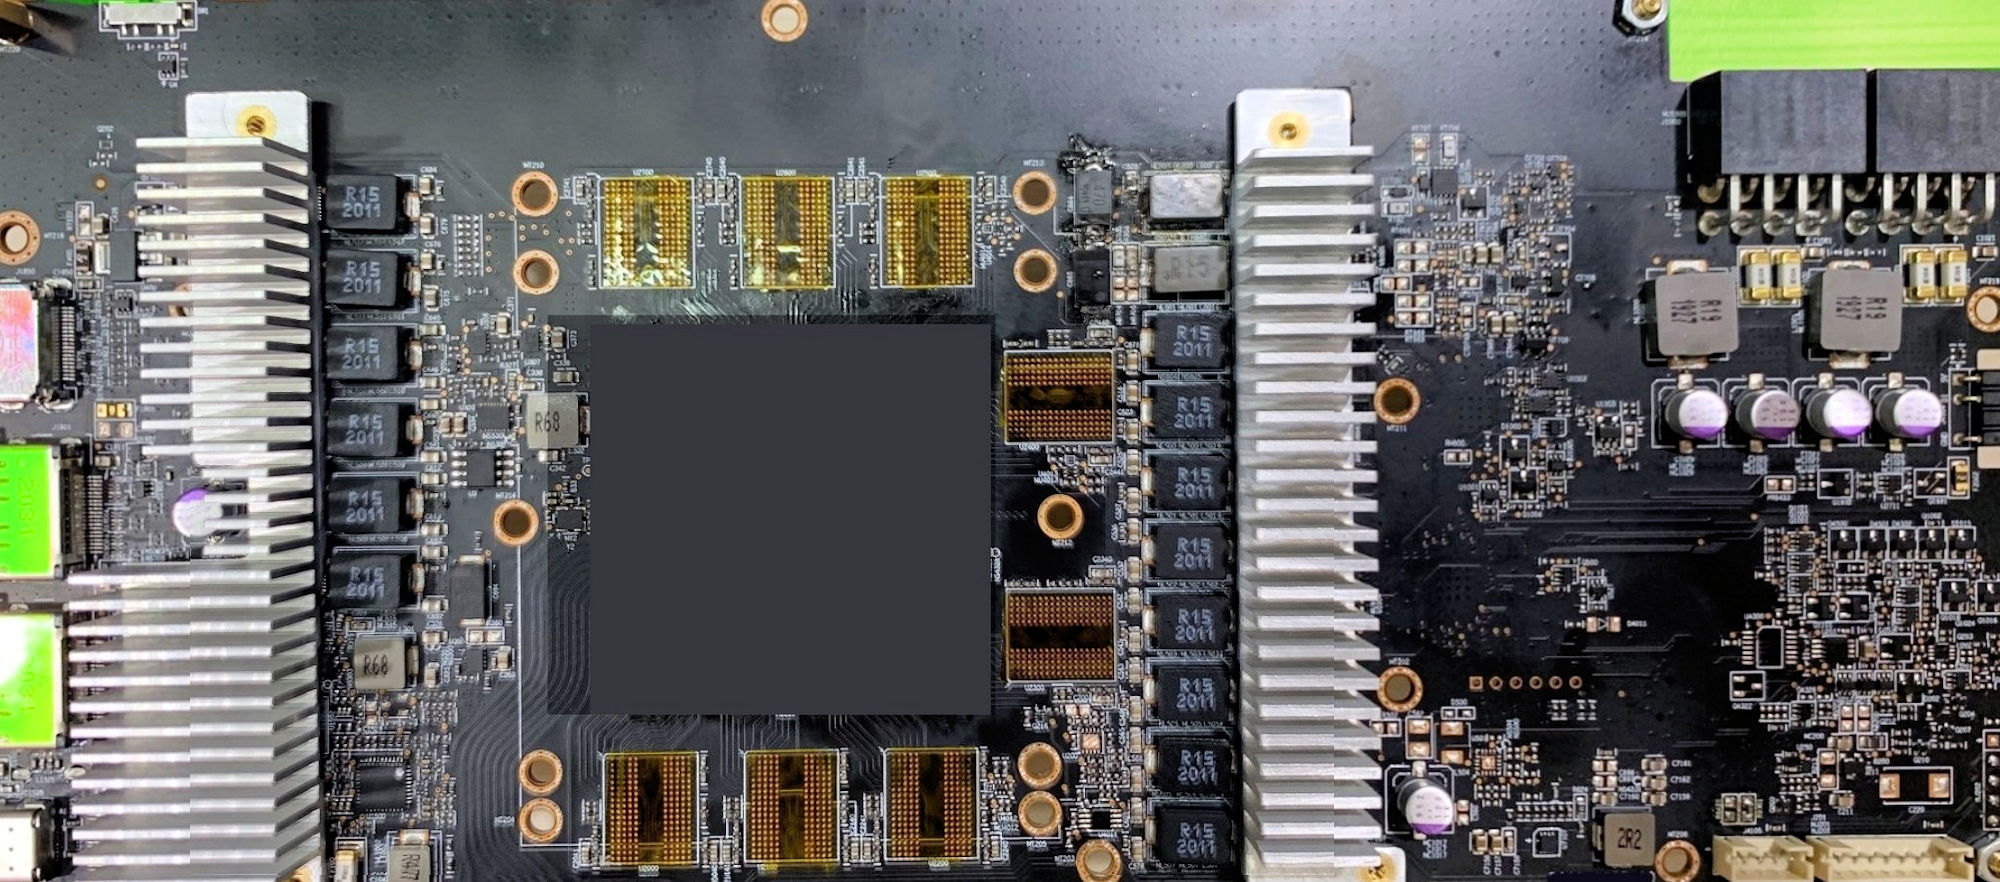 https://www.coolaler.com.tw/image/news/20/10/AMD-Radeon-RX-6800XT-PCB.jpg